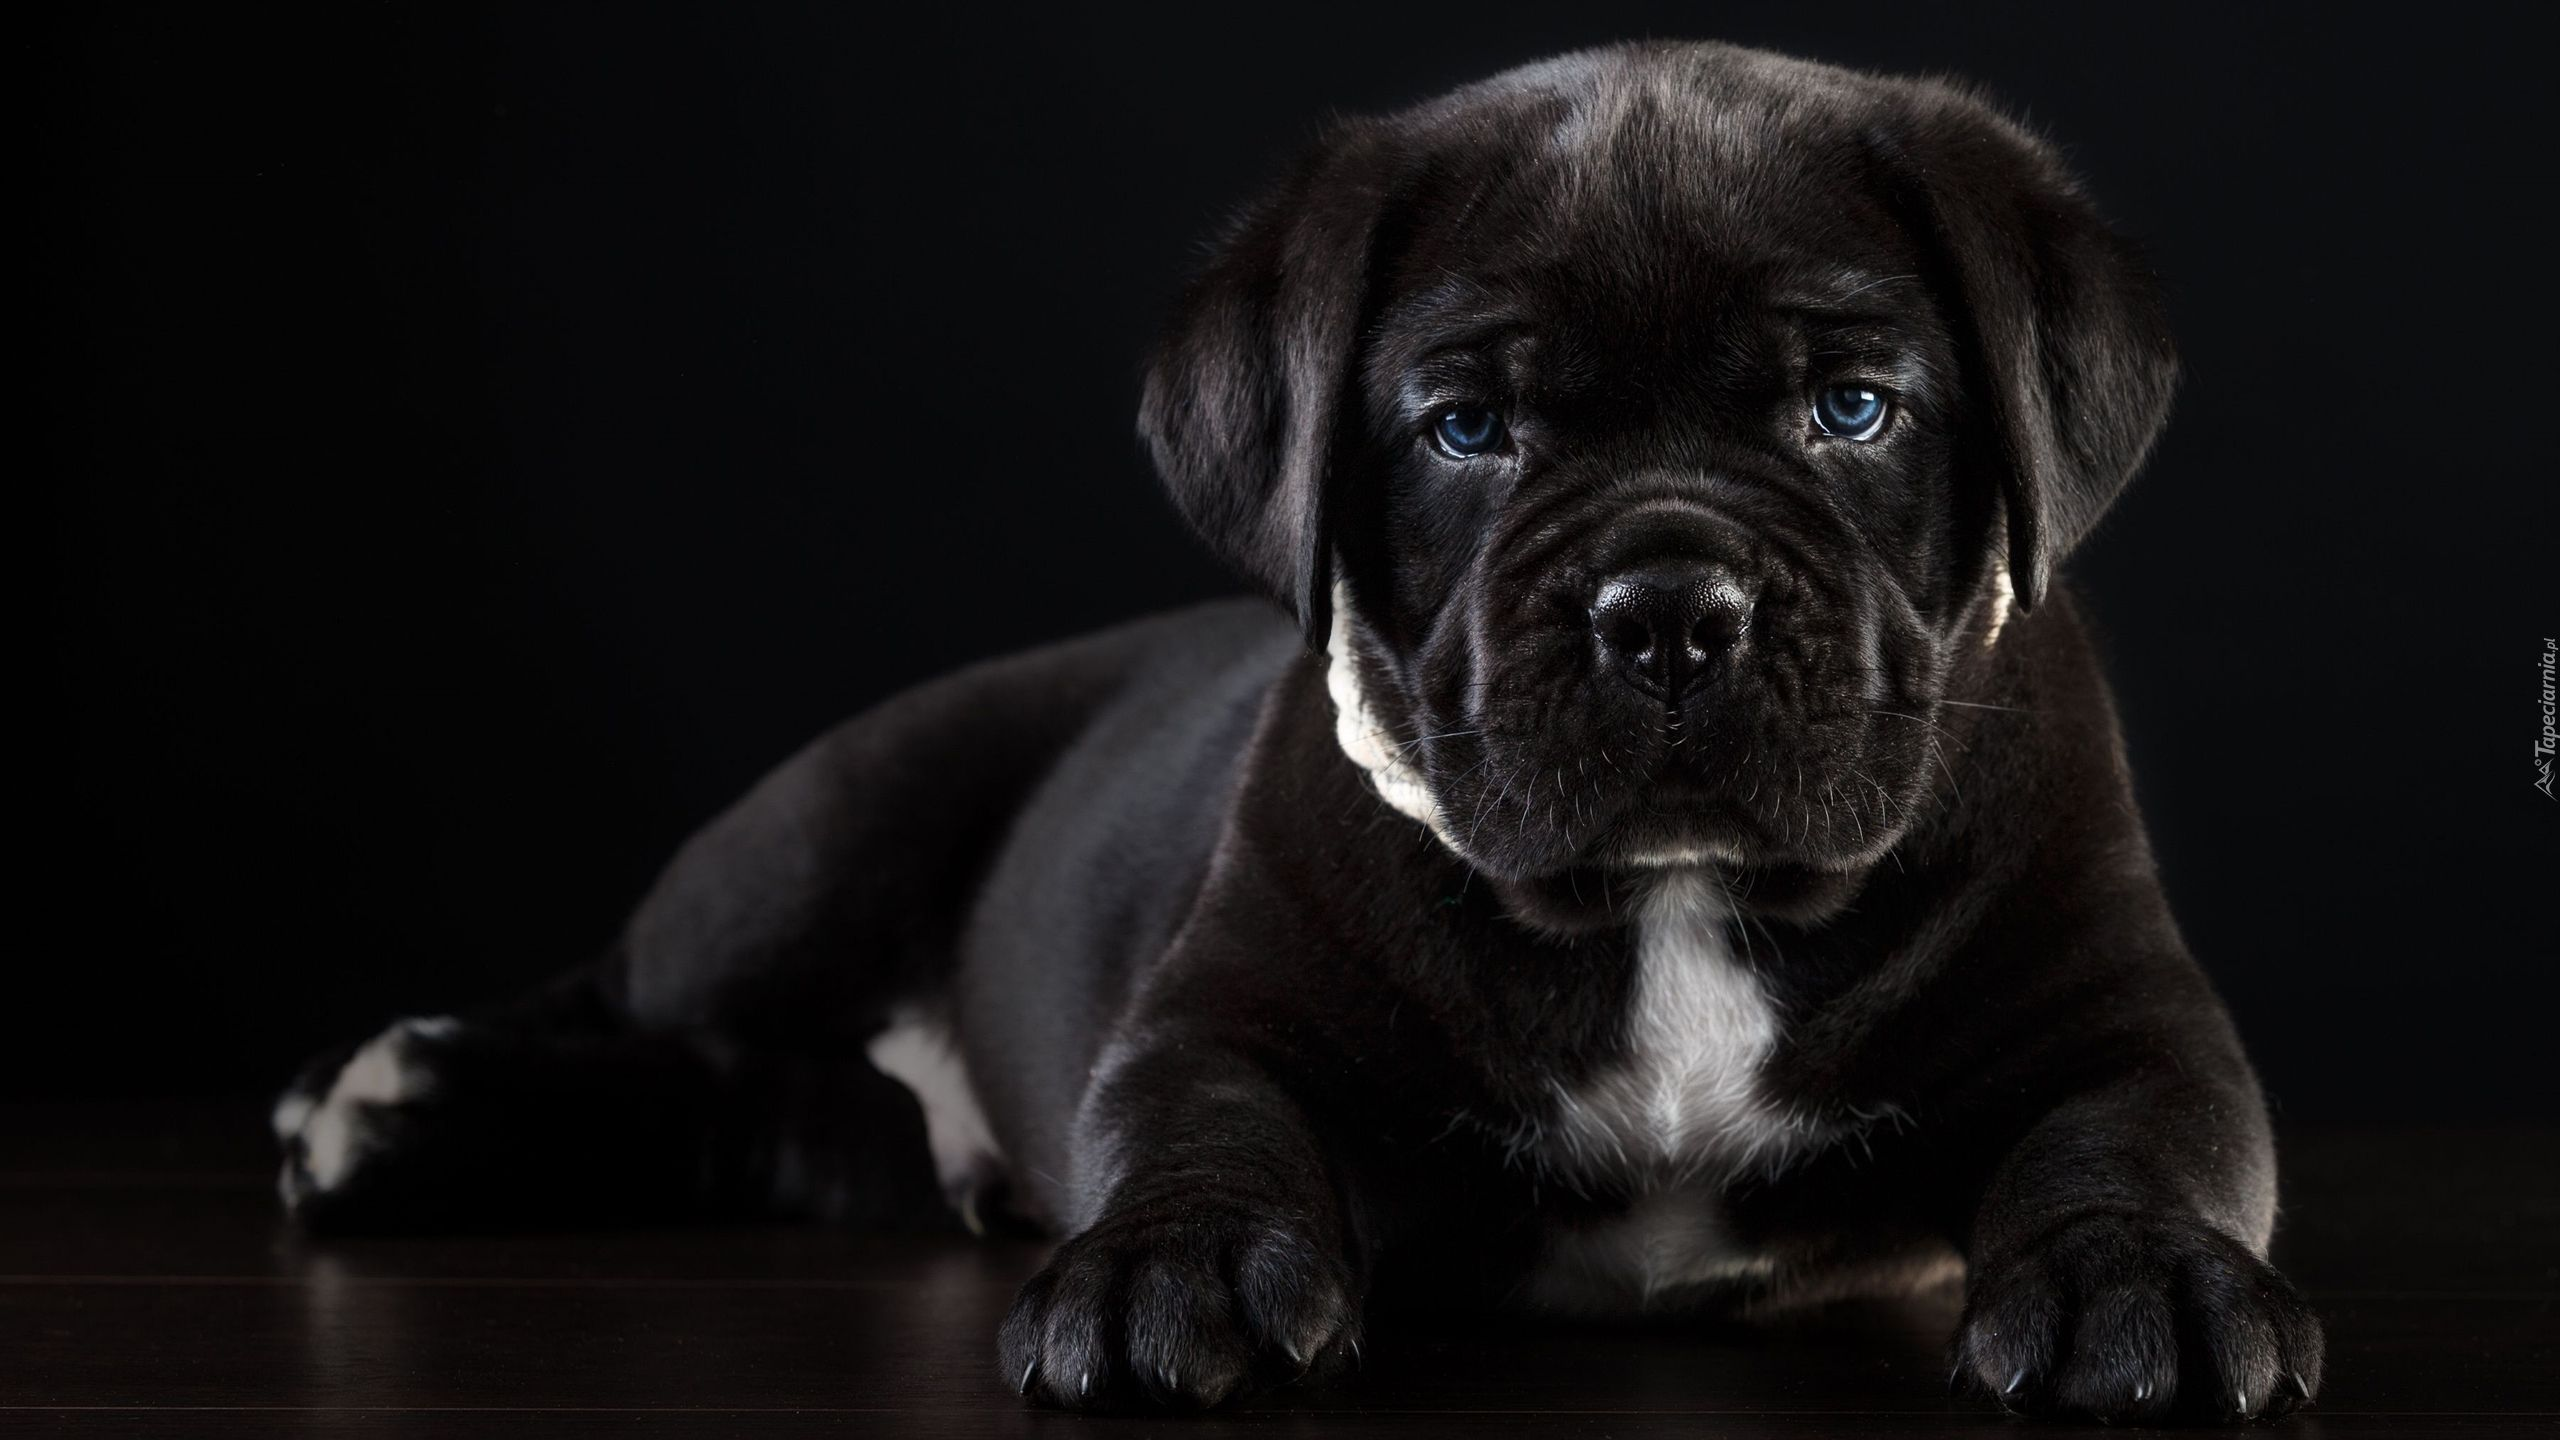 Pies Lezacy Szczeniak Cane Corso